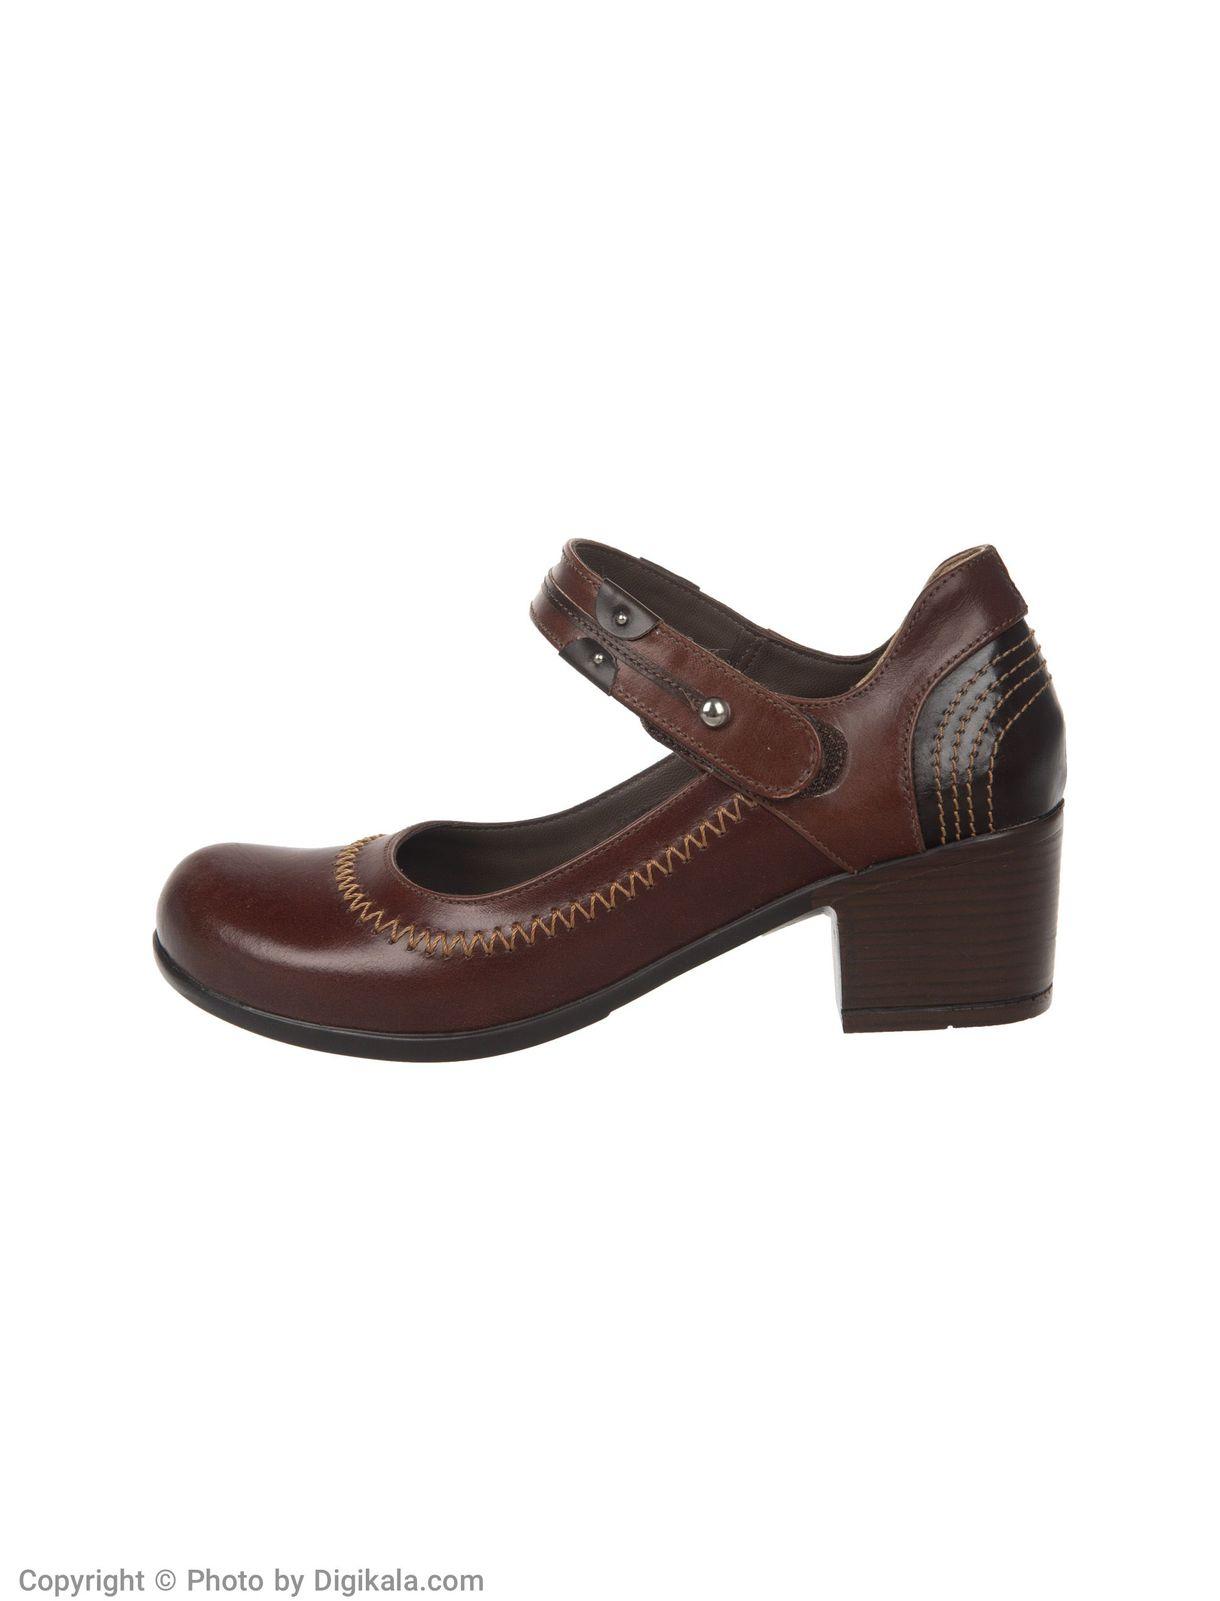 کفش زنانه پانیسا مدل 521-04  Panisa 521-04 Shoes For Women